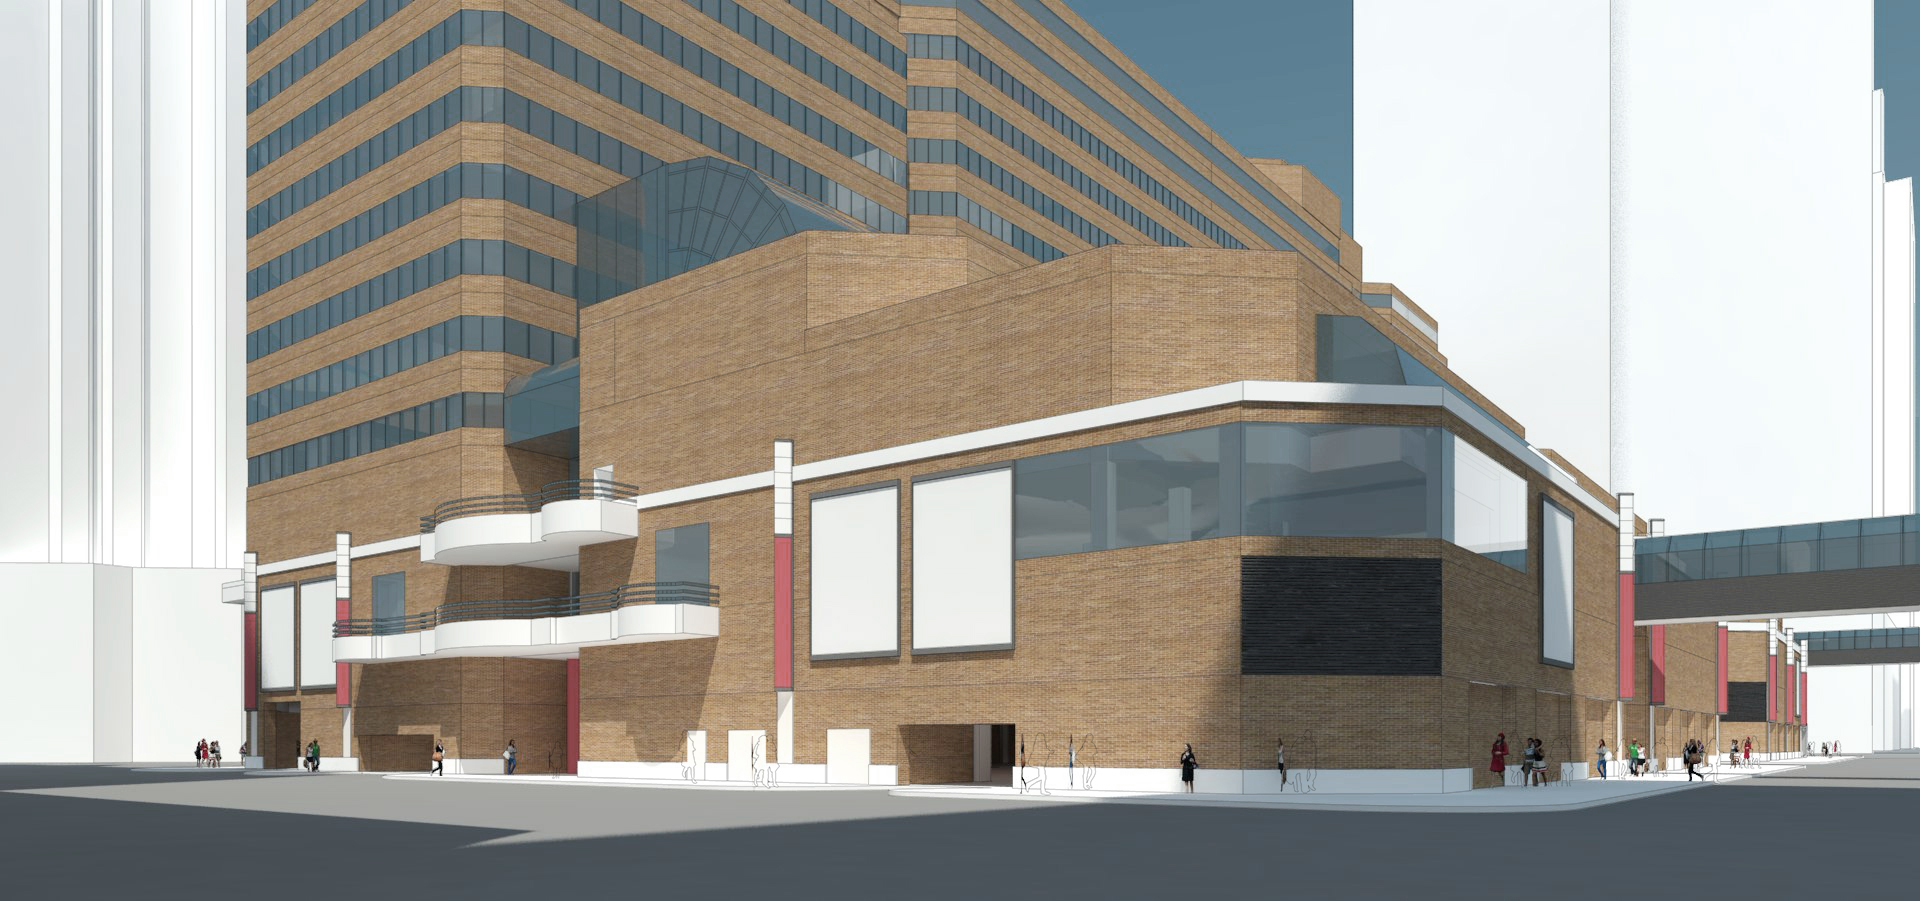 (4/7) Houston Center - Campus Renovation